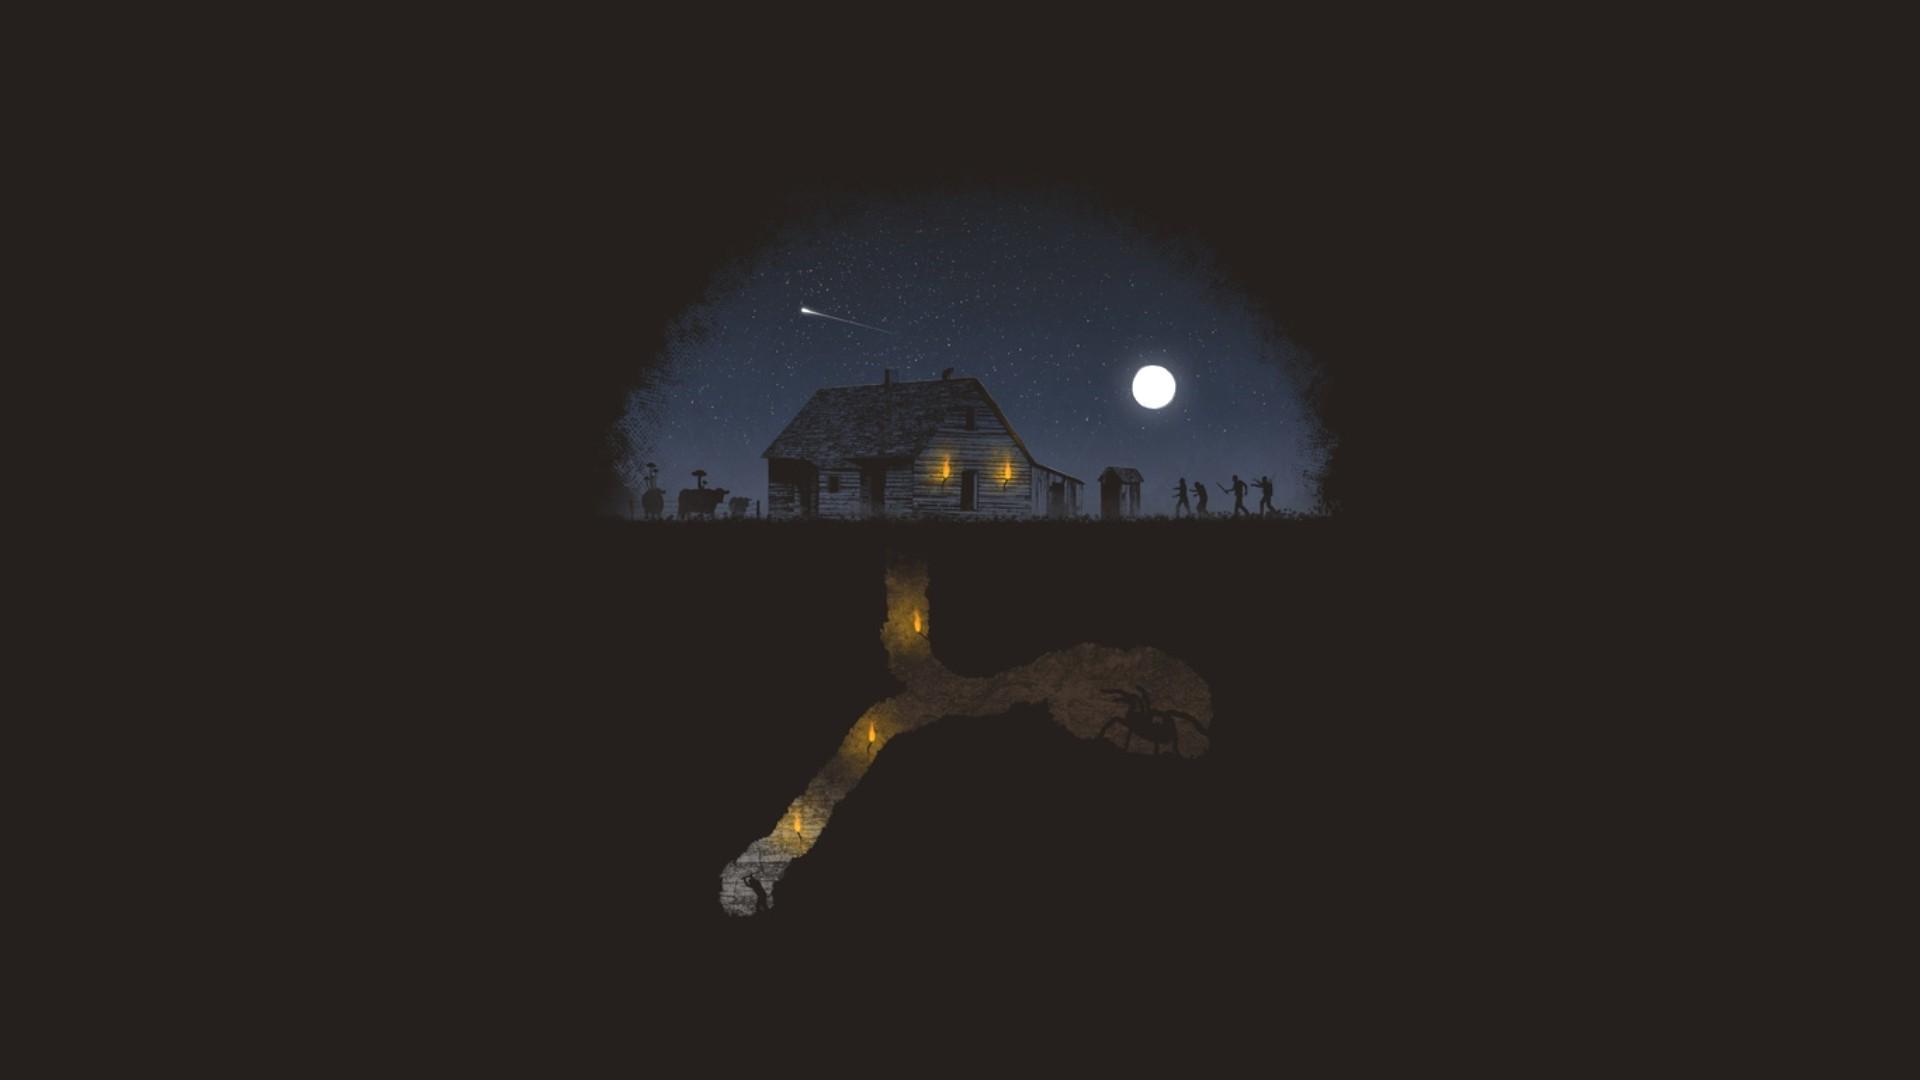 Fantastic Wallpaper Minecraft Minimalistic - space-minimalism-Earth-Moon-Minecraft-moonlight-atmosphere-zombies-spider-darkness-screenshot-1920x1080-px-computer-wallpaper-atmosphere-of-earth-561875  Picture_894020.jpg